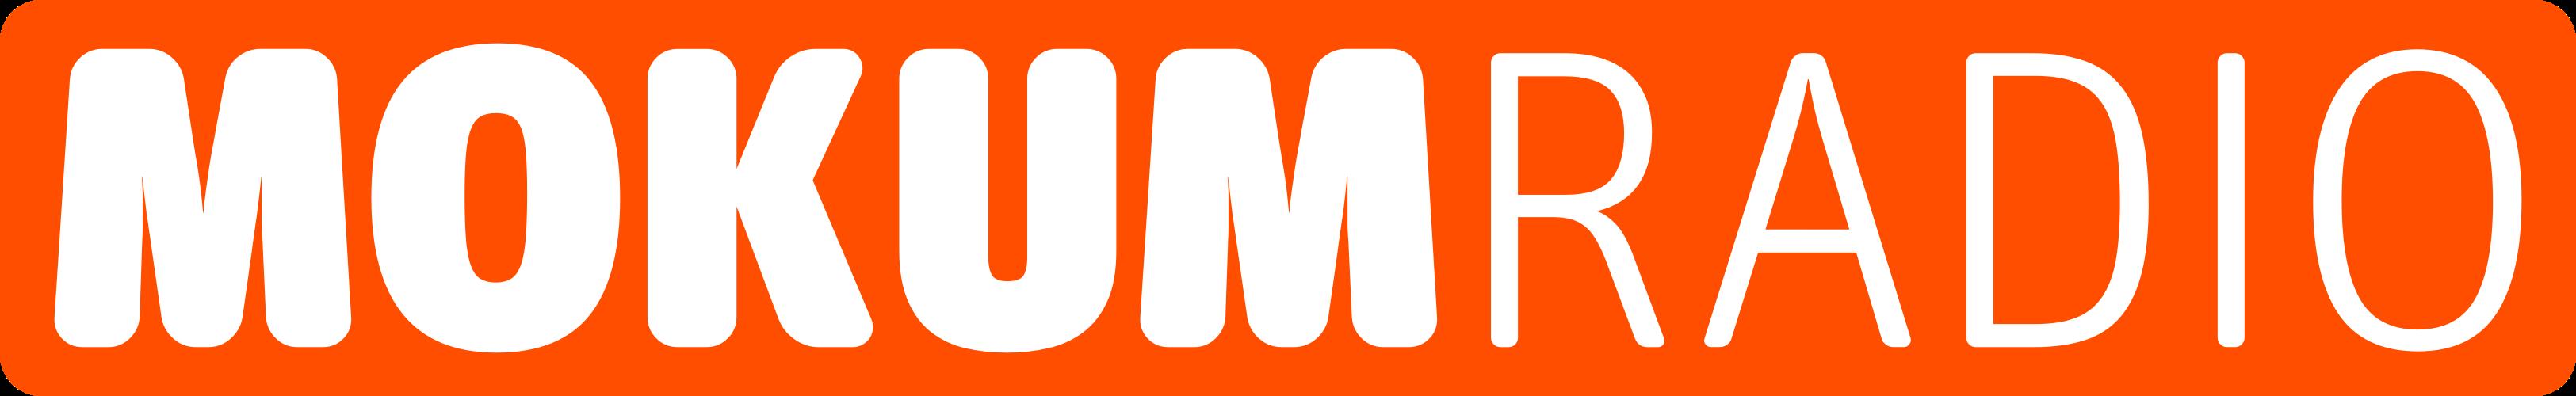 mokumradio logo